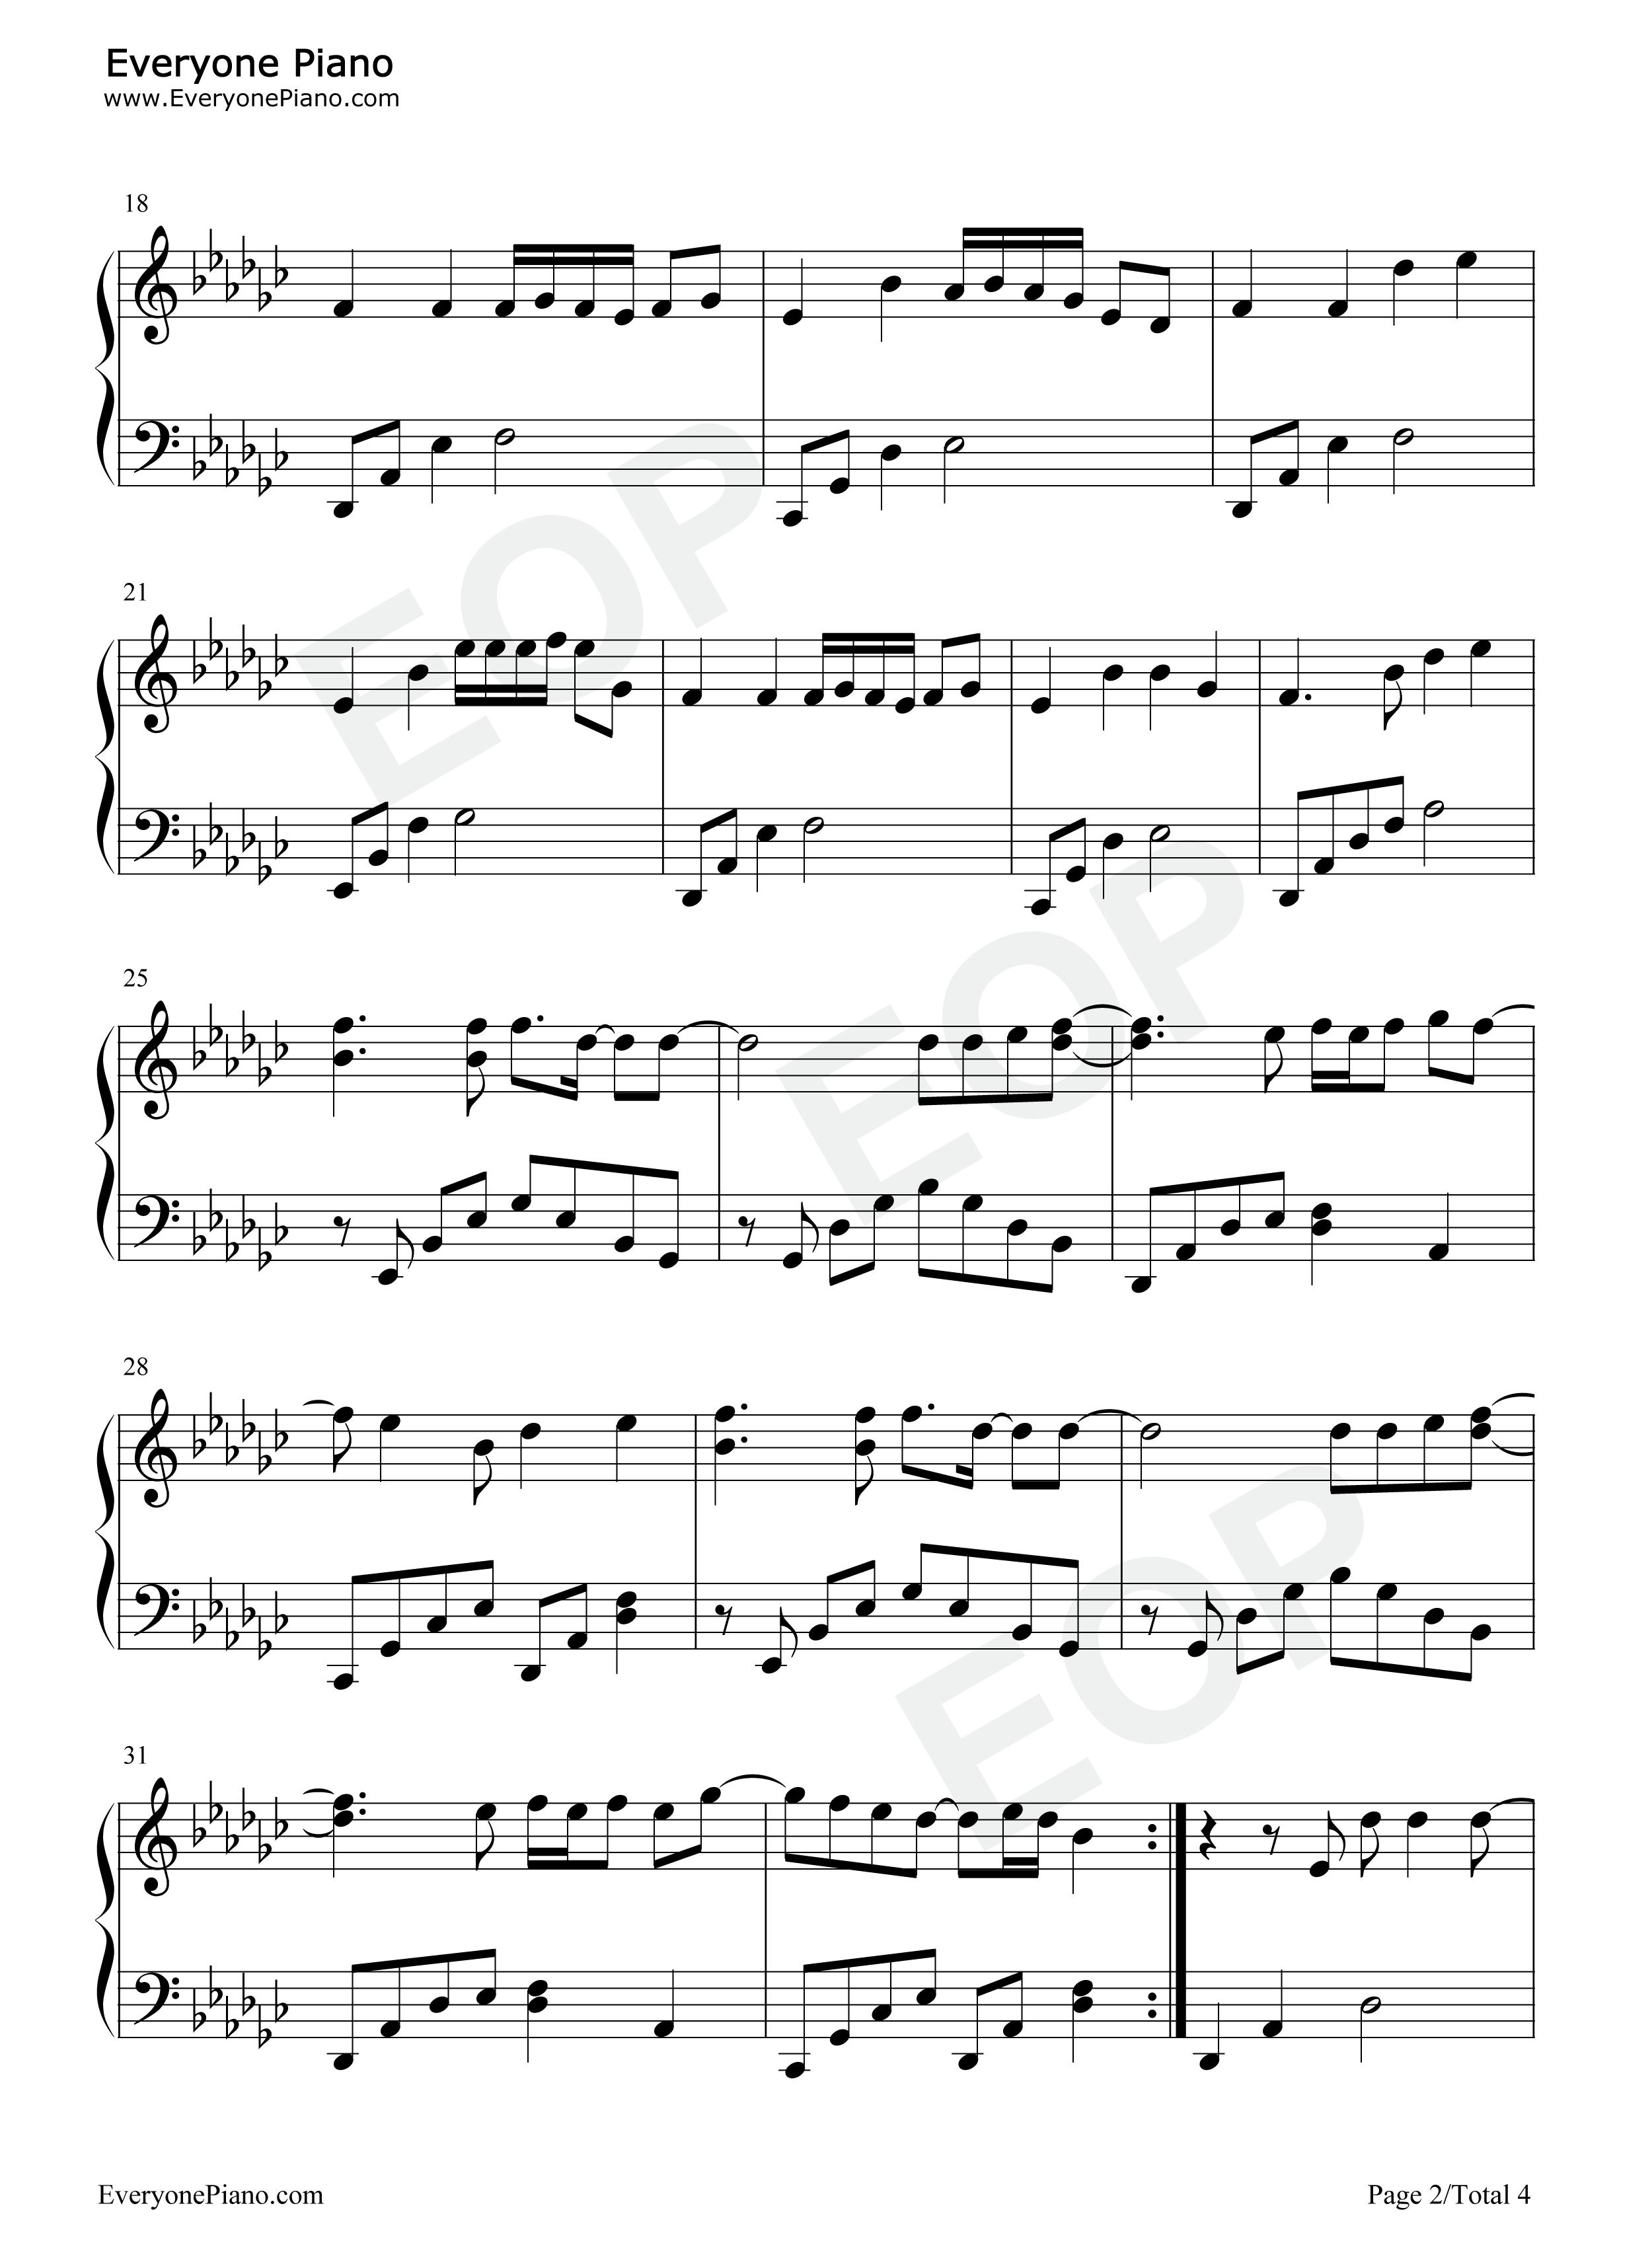 linkin park sheet music pdf